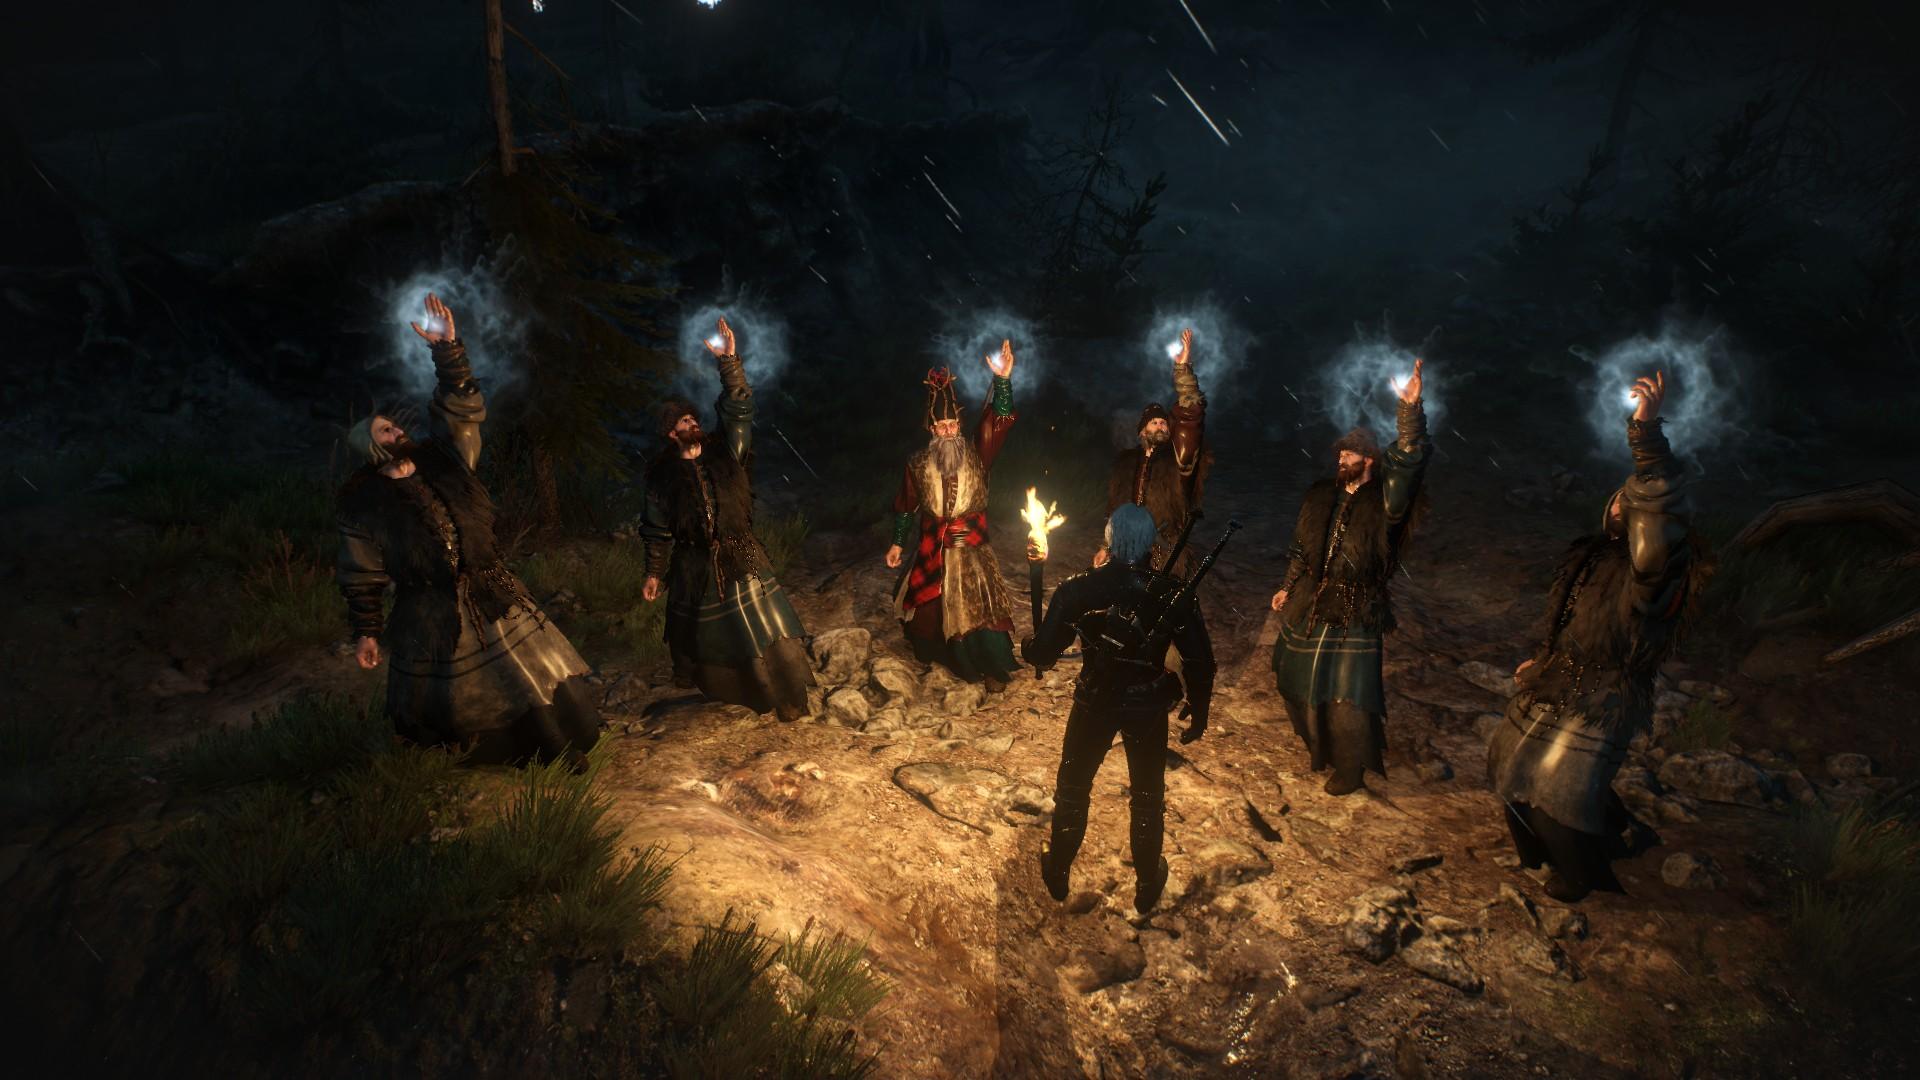 The Witcher 3 Screenshot 2019.02.05 - 13.07.39.75.jpg - Witcher 3: Wild Hunt, the